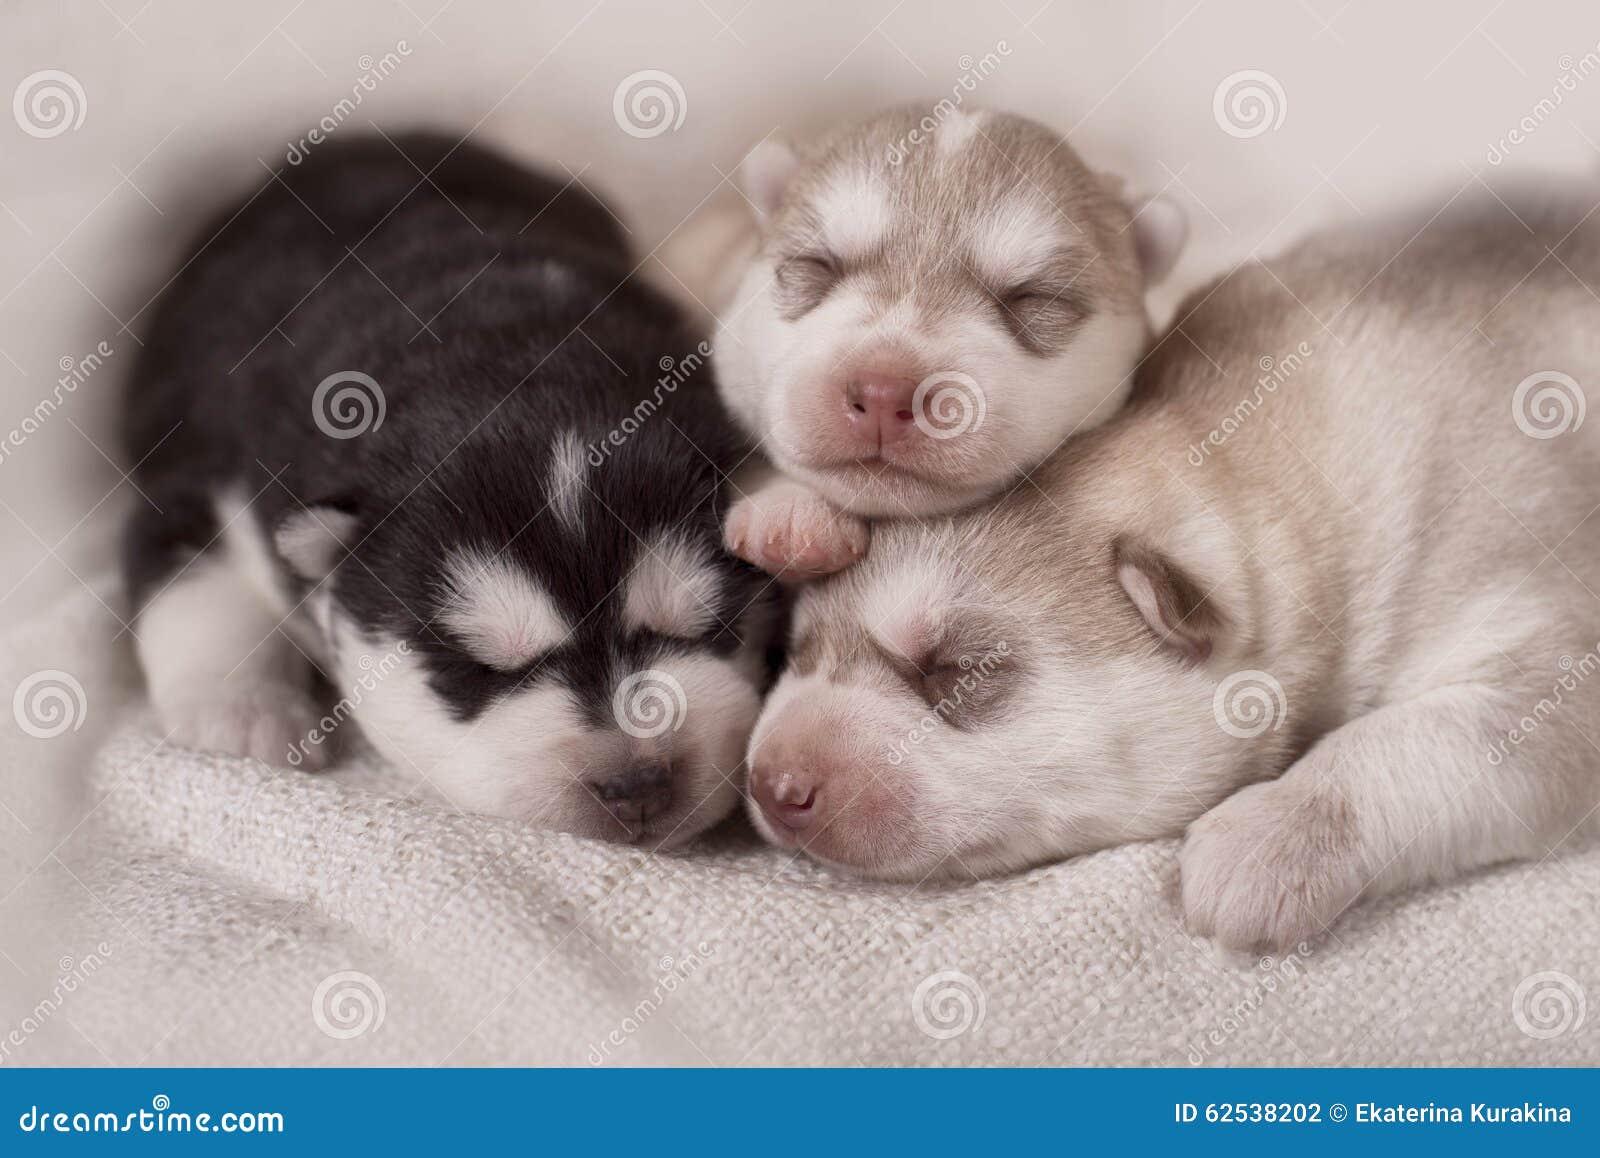 Newborn Siberian Husky Puppies Stock Photo - Image: 62538202